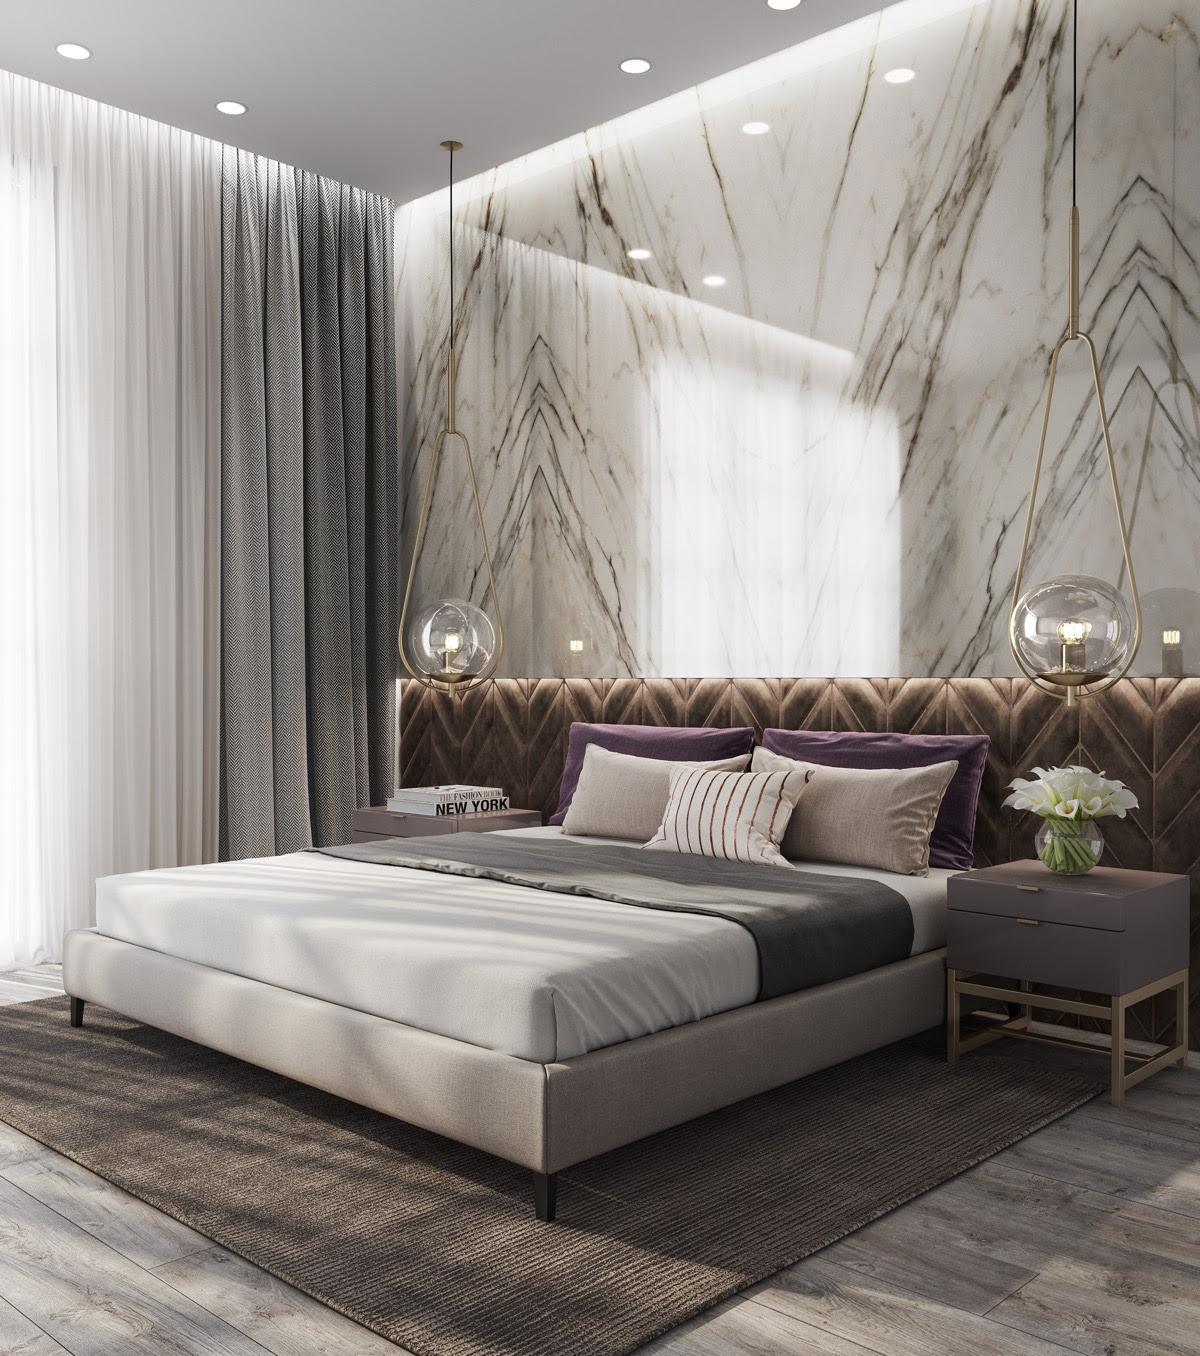 Bedroom Luxury Marble Flooring Luxury Bedrooms Ideas